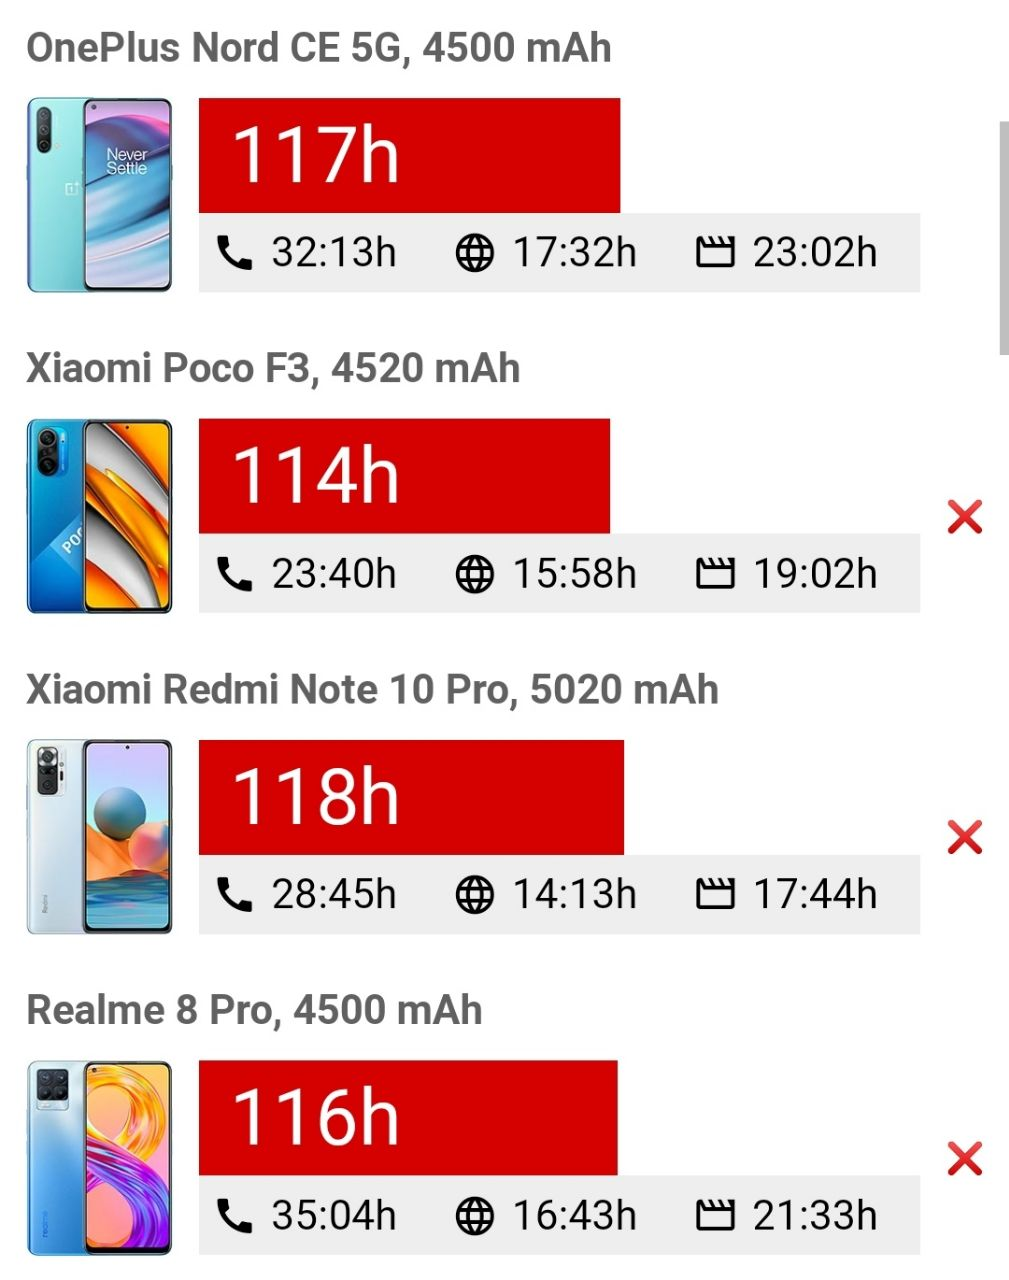 مقایسه عمر باتری OnePlus Nord CE 5G